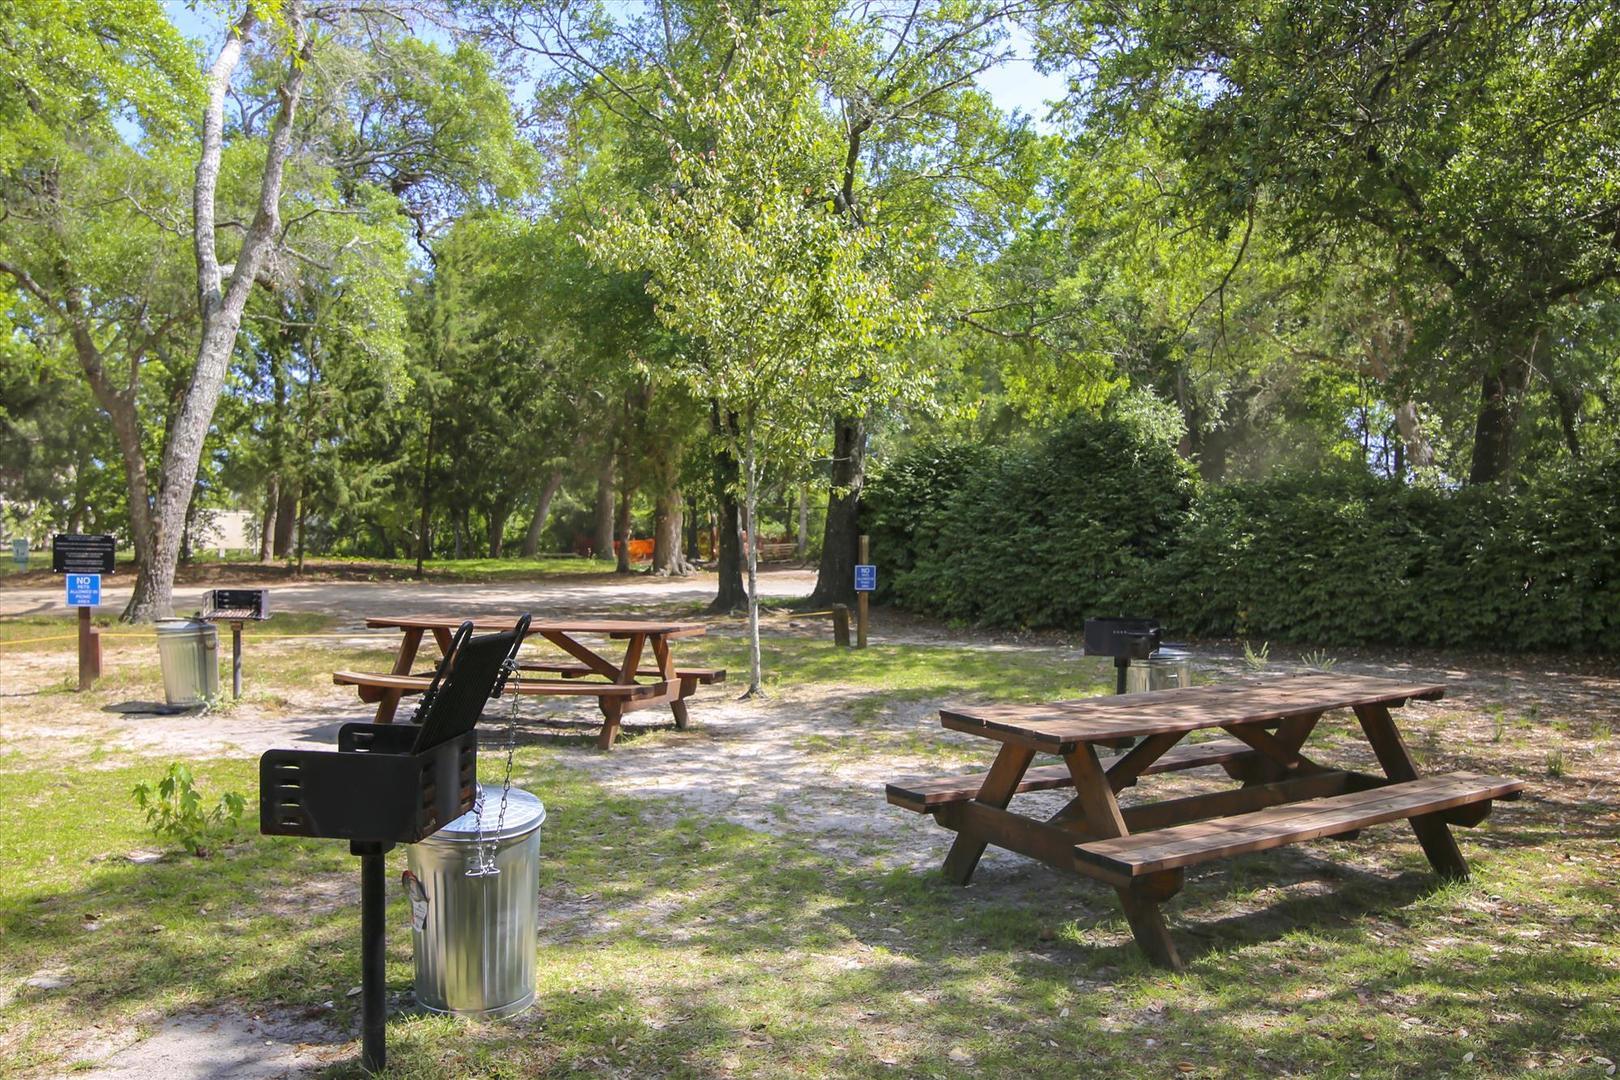 Ocean Creek - Picnic and Grilling Area